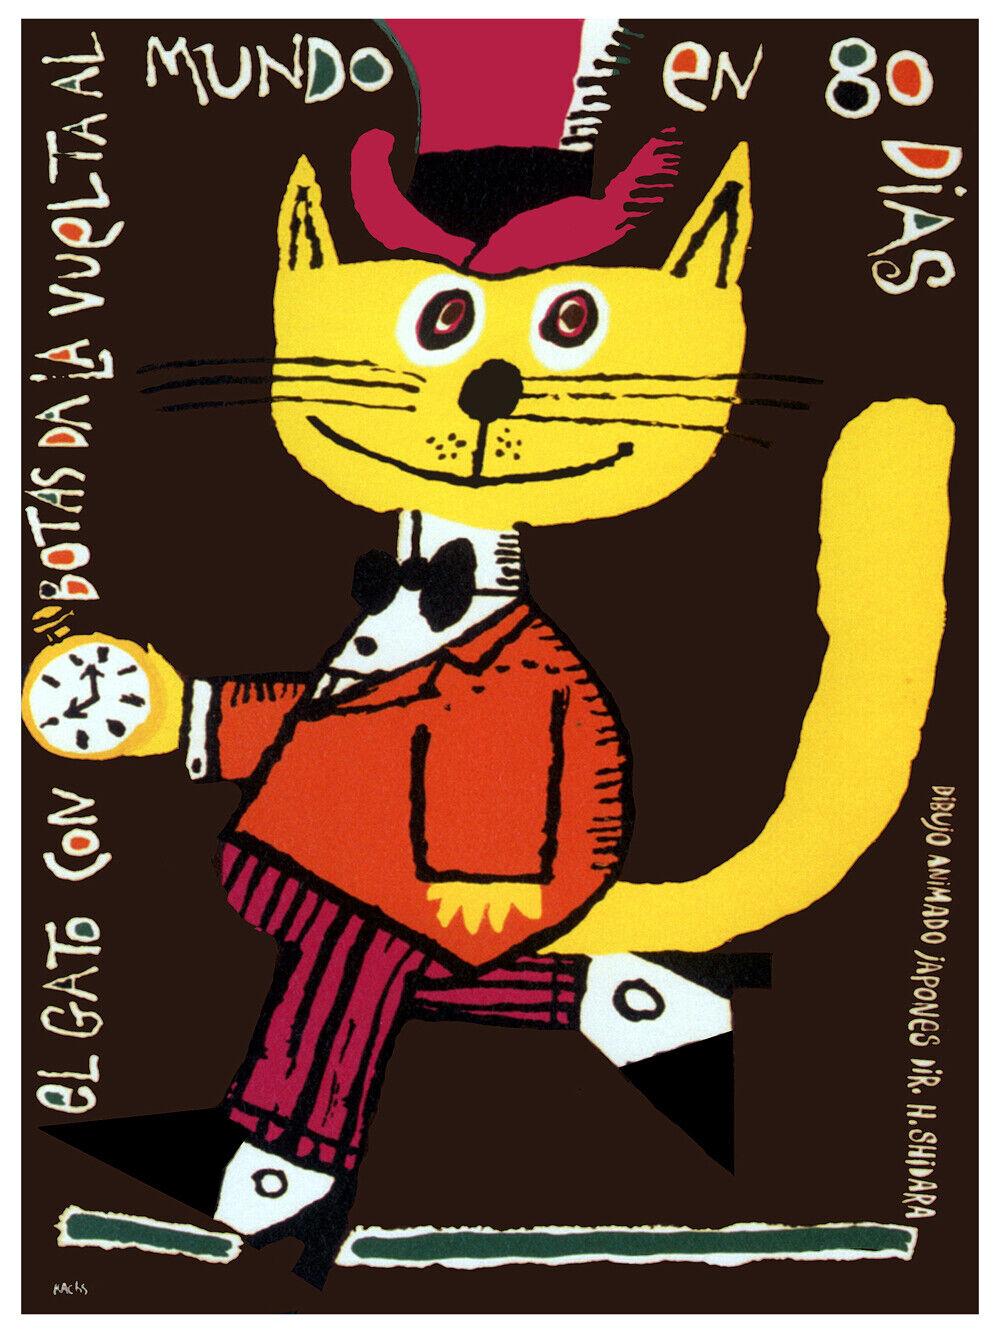 8258.Decoration Poster.Home Room wall art design print.giallo elegant Cat movie